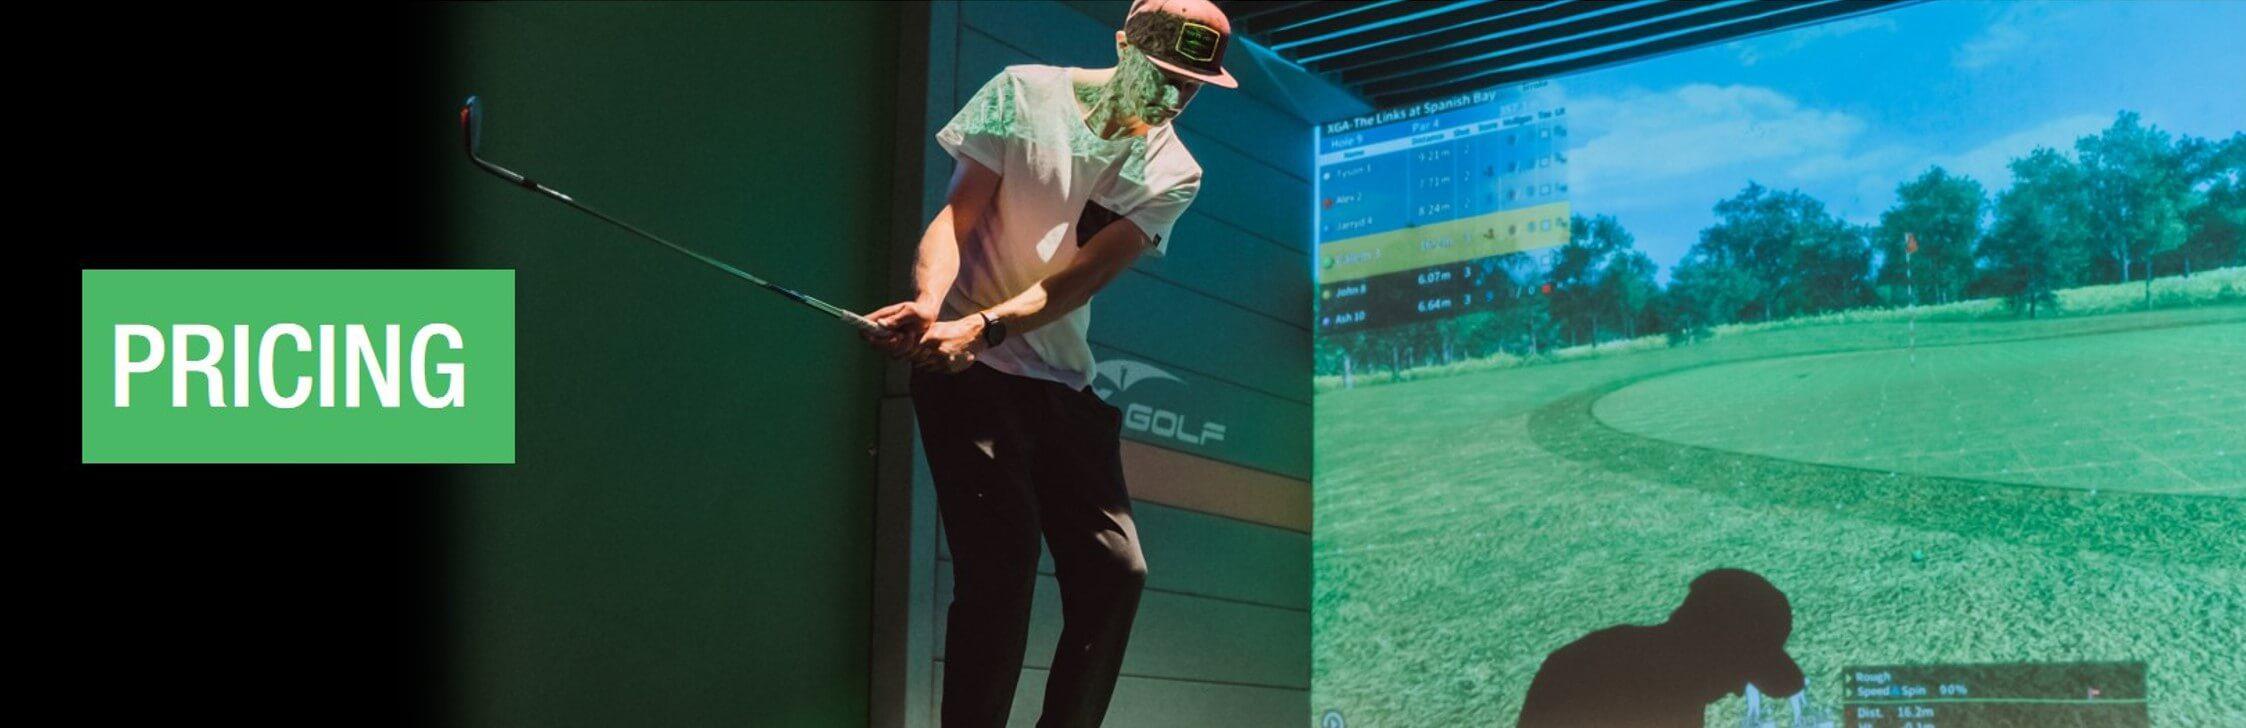 X-Golf Simulator Pricing